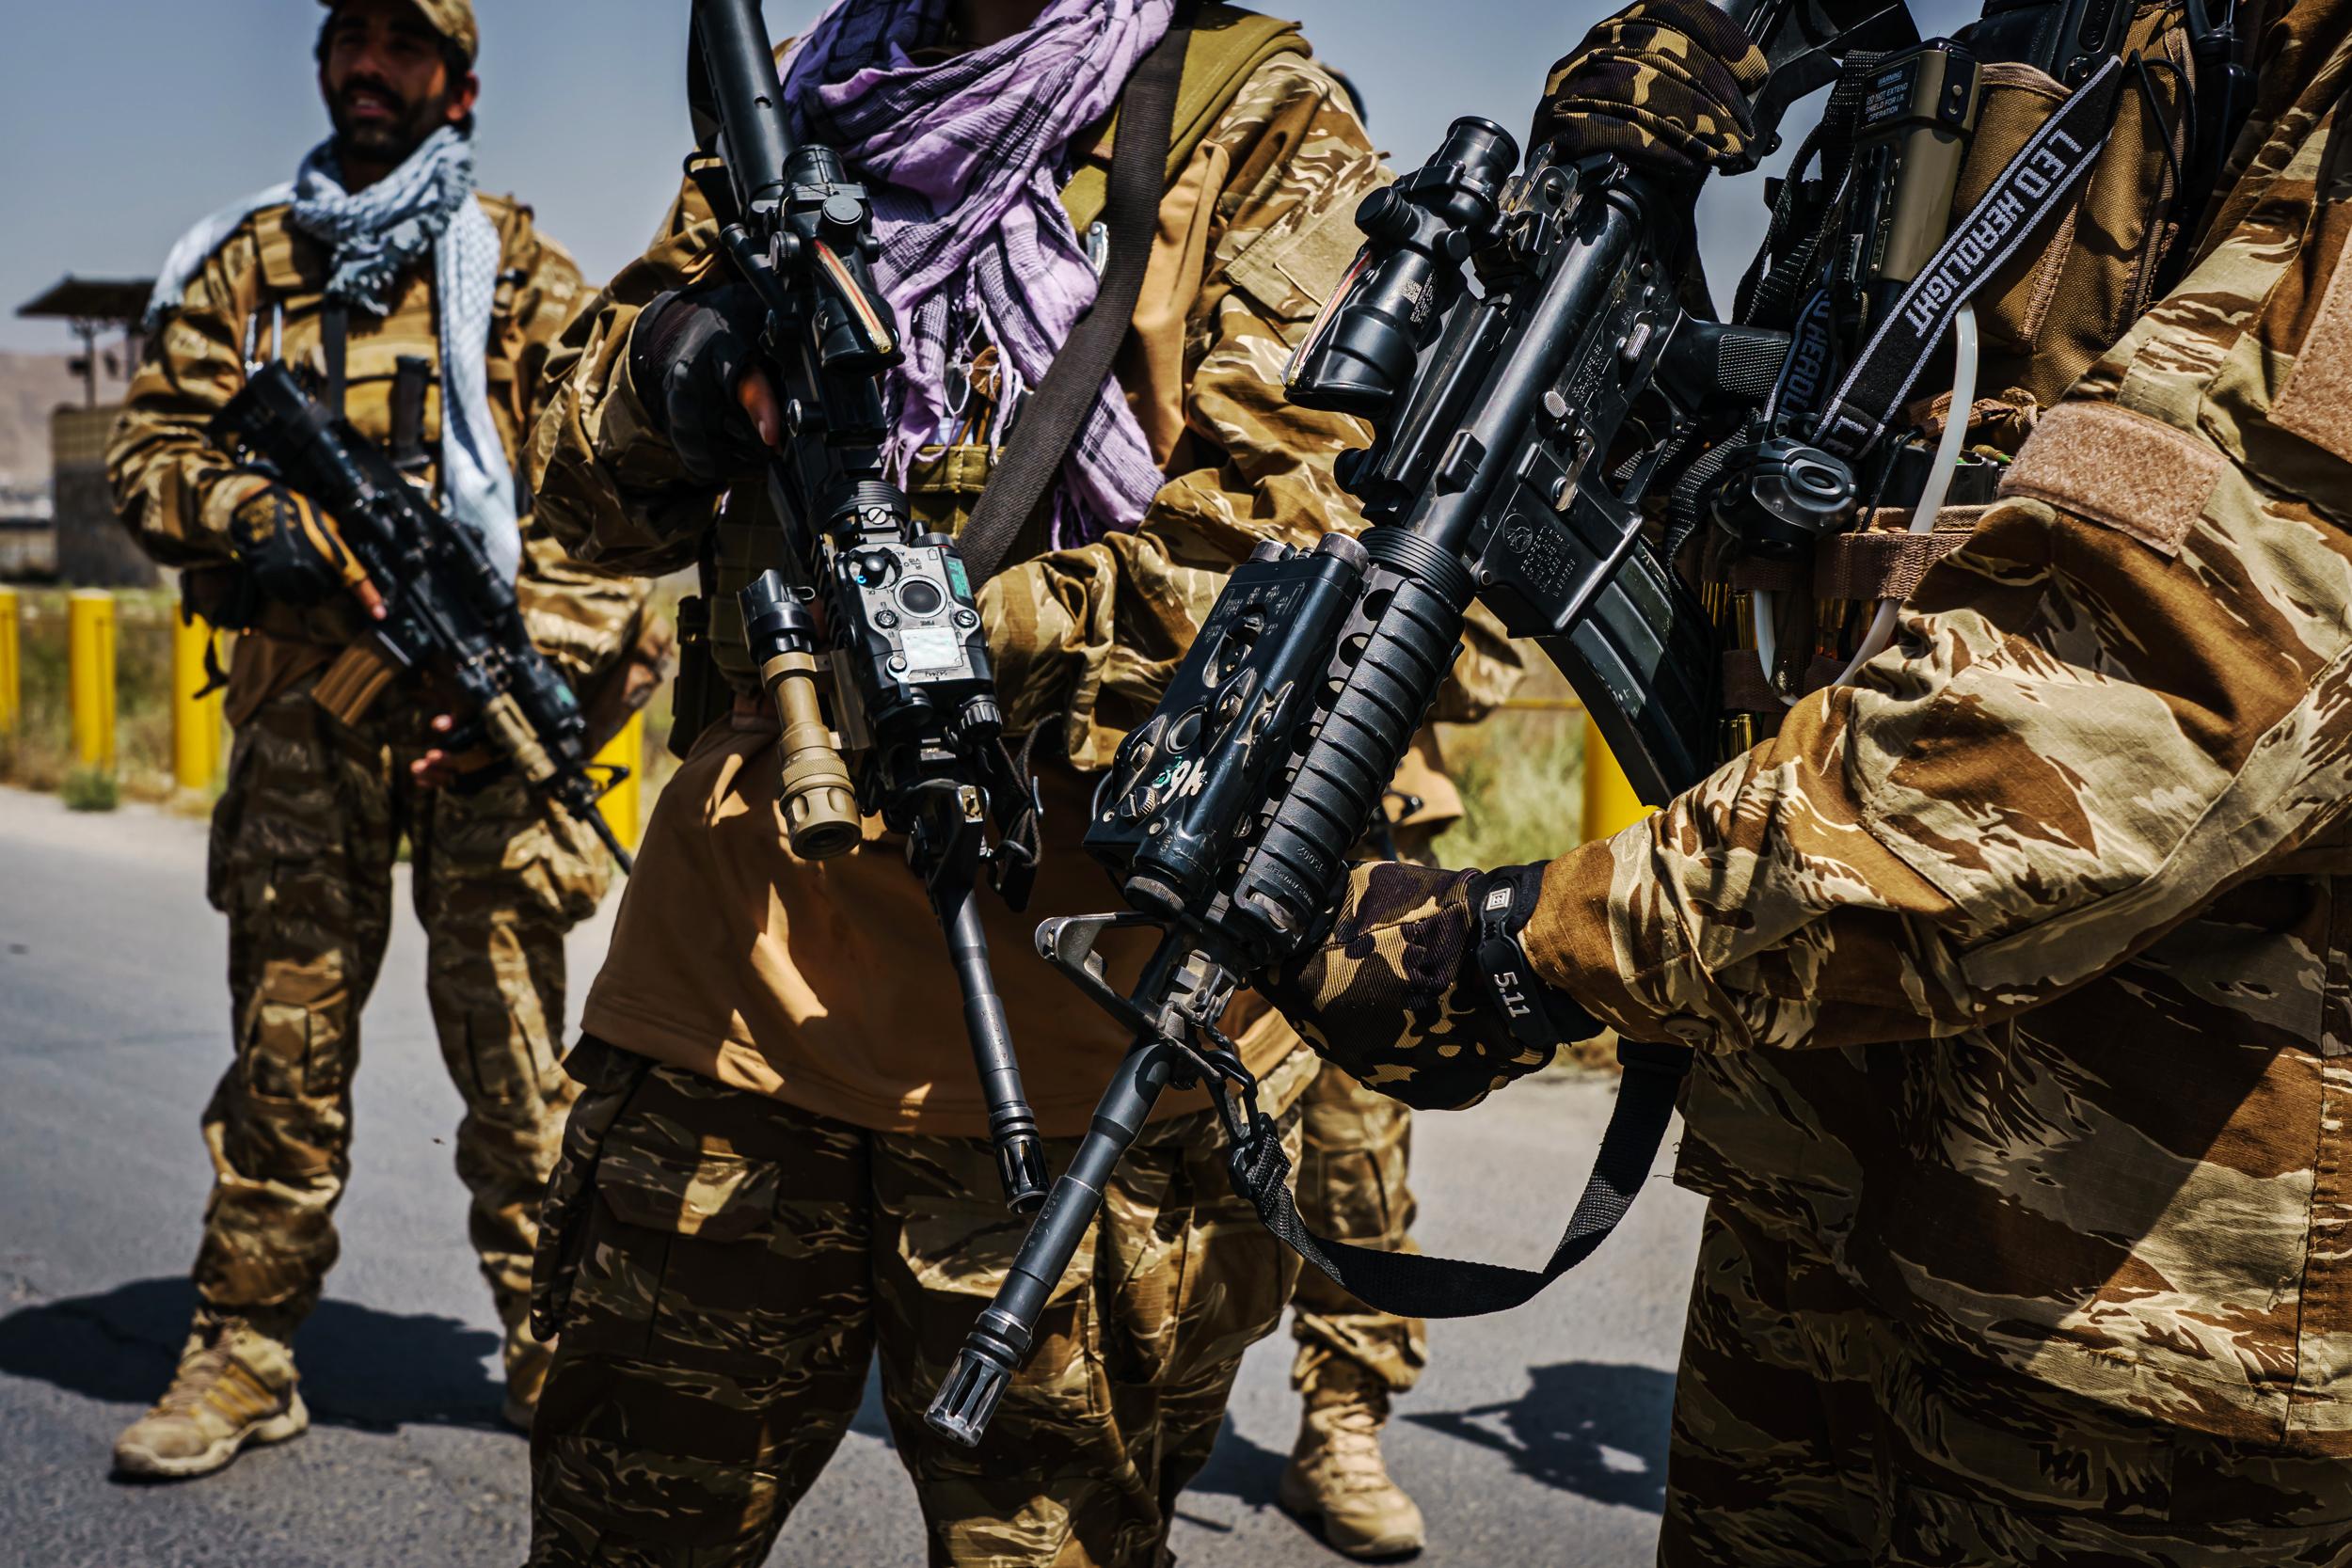 Did we win the War on Terror?